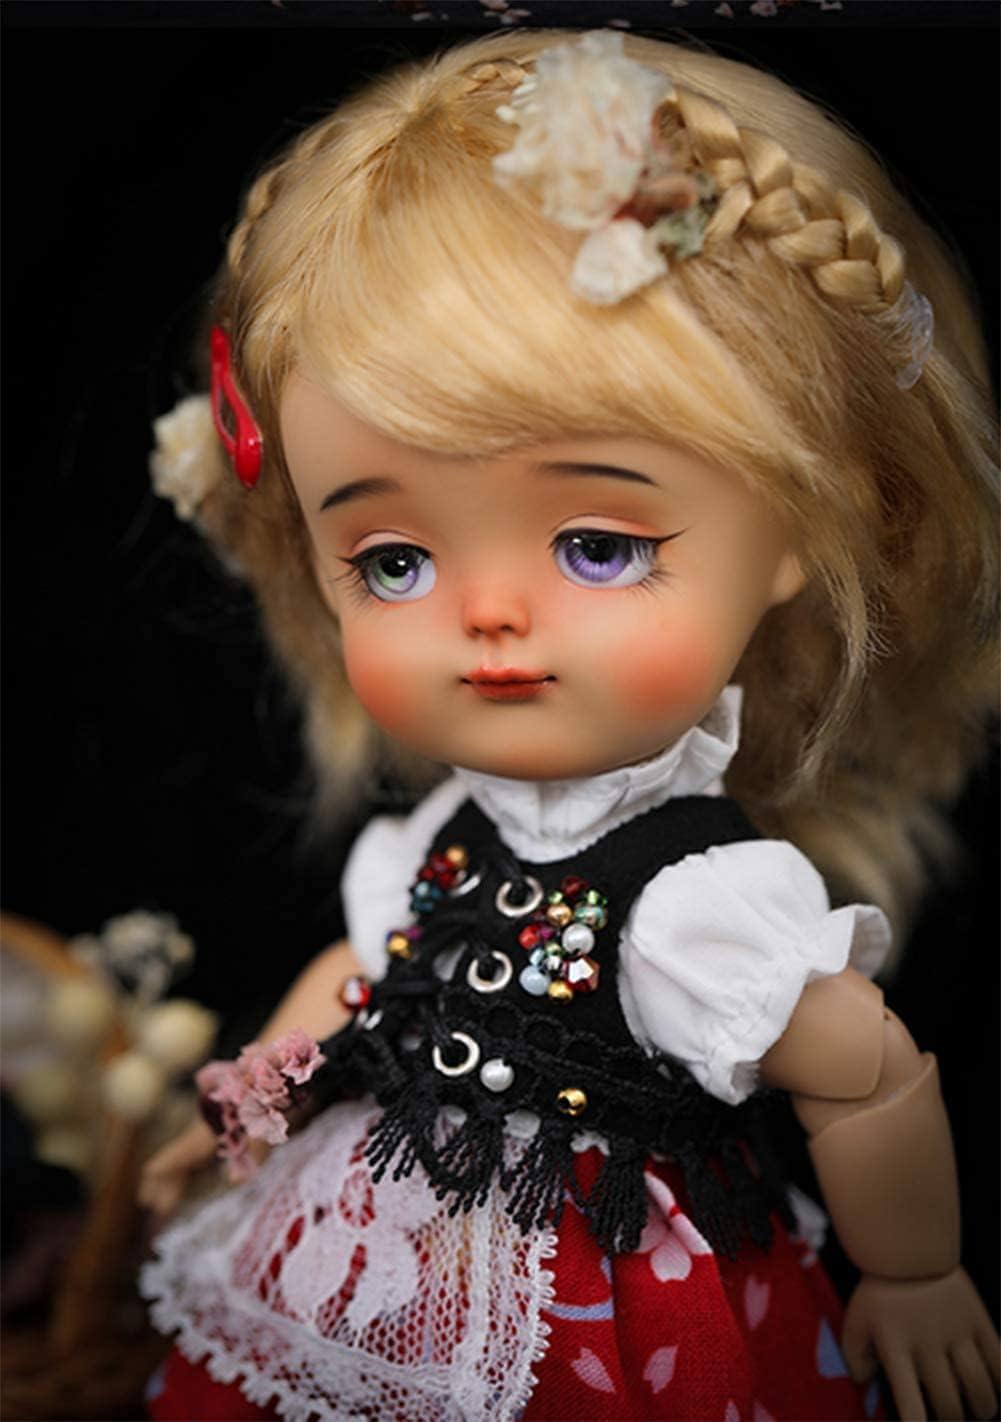 NIHE 1/8 SD Smart Doll BJD Dolls16 Inch 13 Ball Jointed Doll DIY